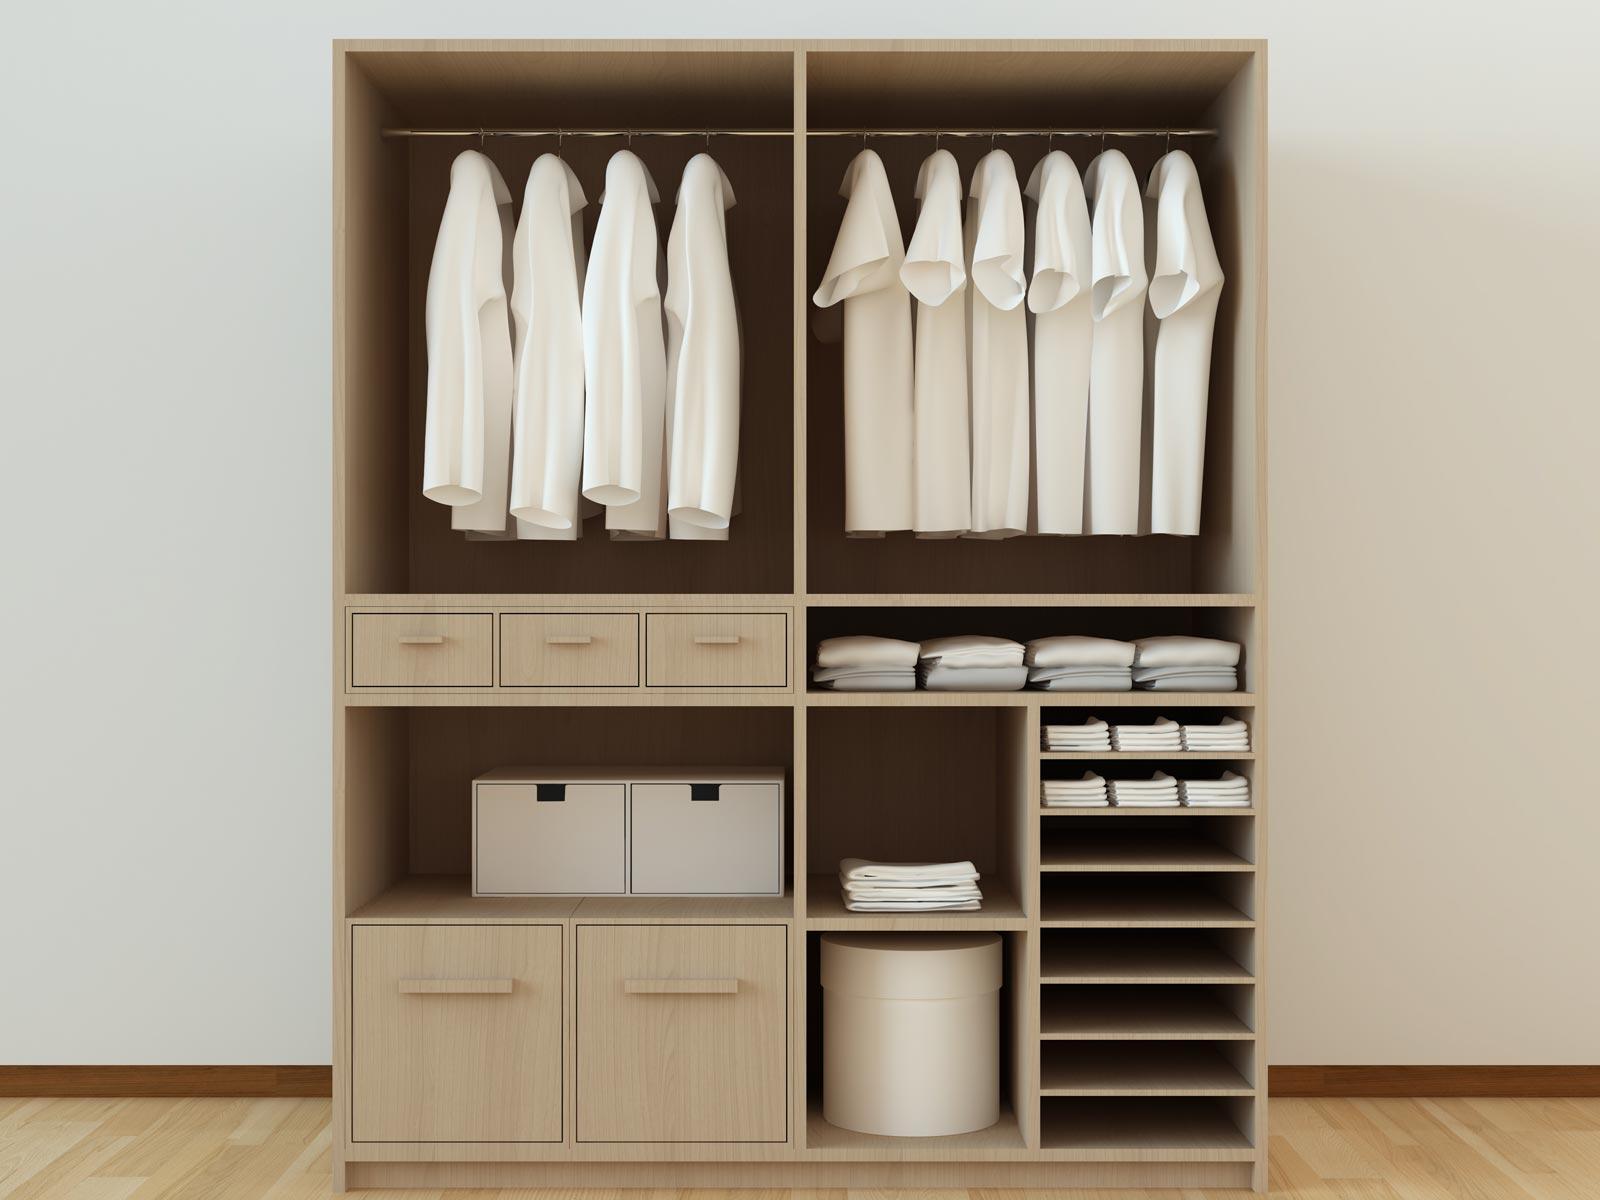 Meuble sur mesure pour la chambre dressing sur mesure for Tipos de closet para dormitorios